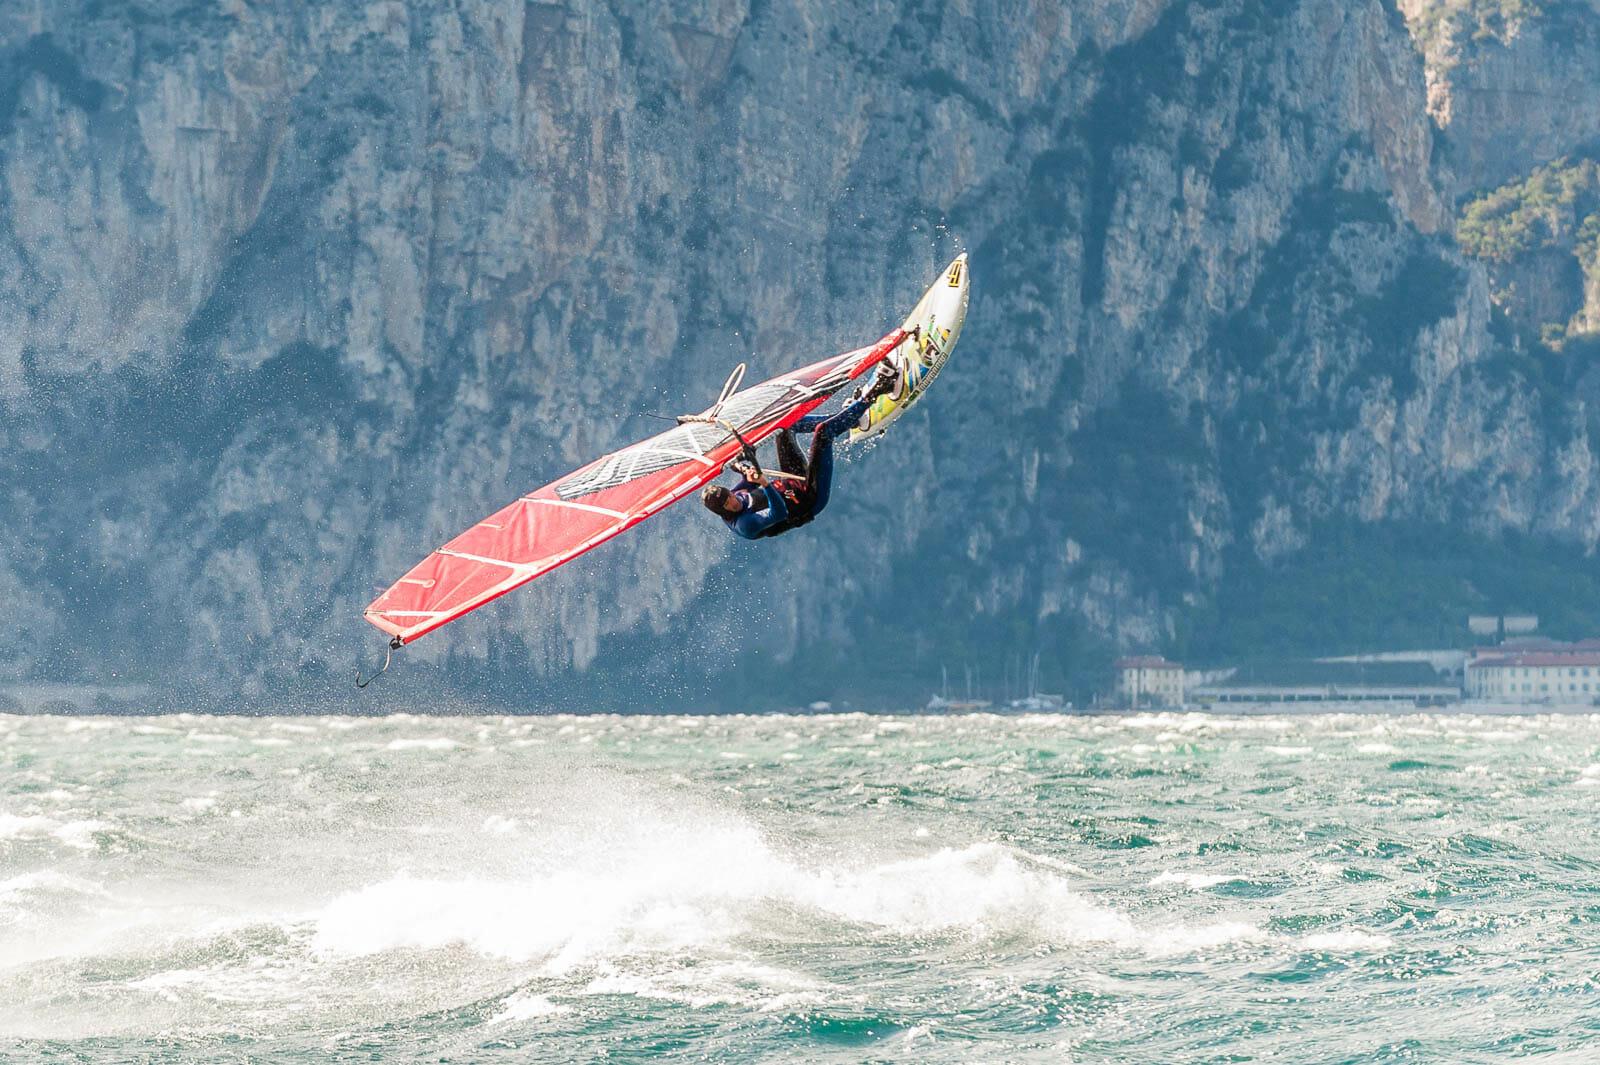 wind storm with fabio calò in brenzone